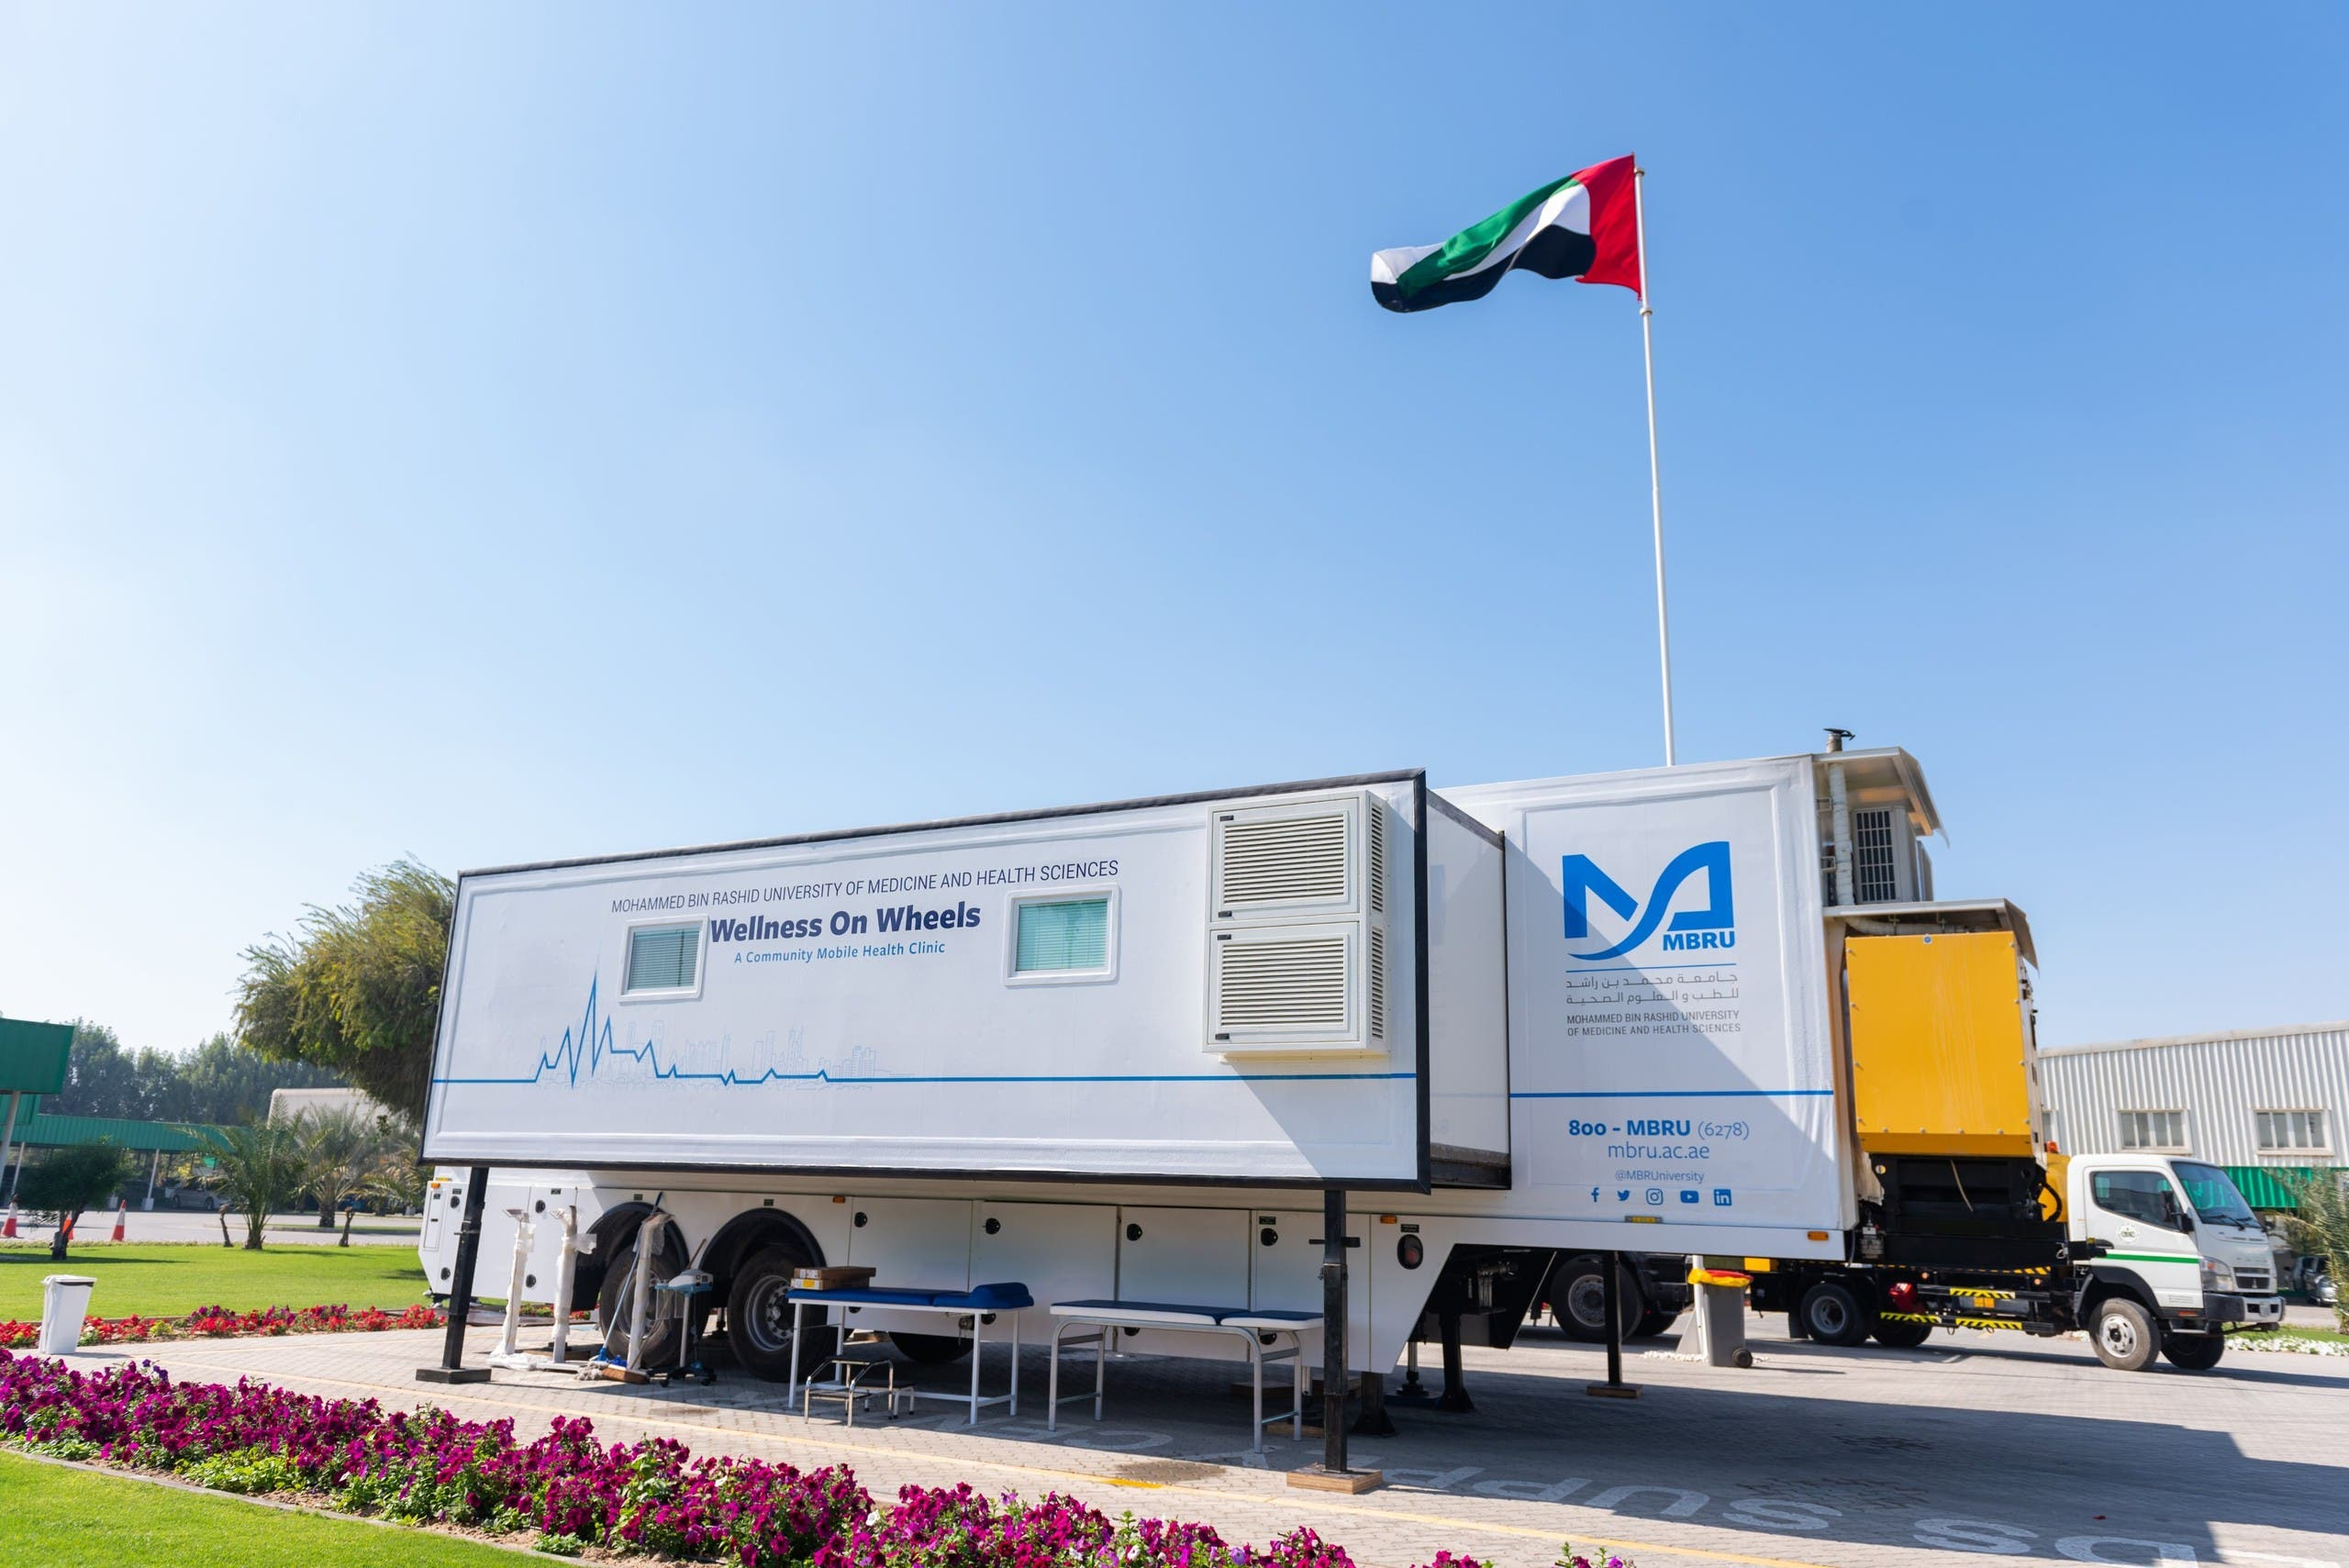 Wellness on Wheels mobile vaccination clinics in Dubai, UAE. (Twitter)